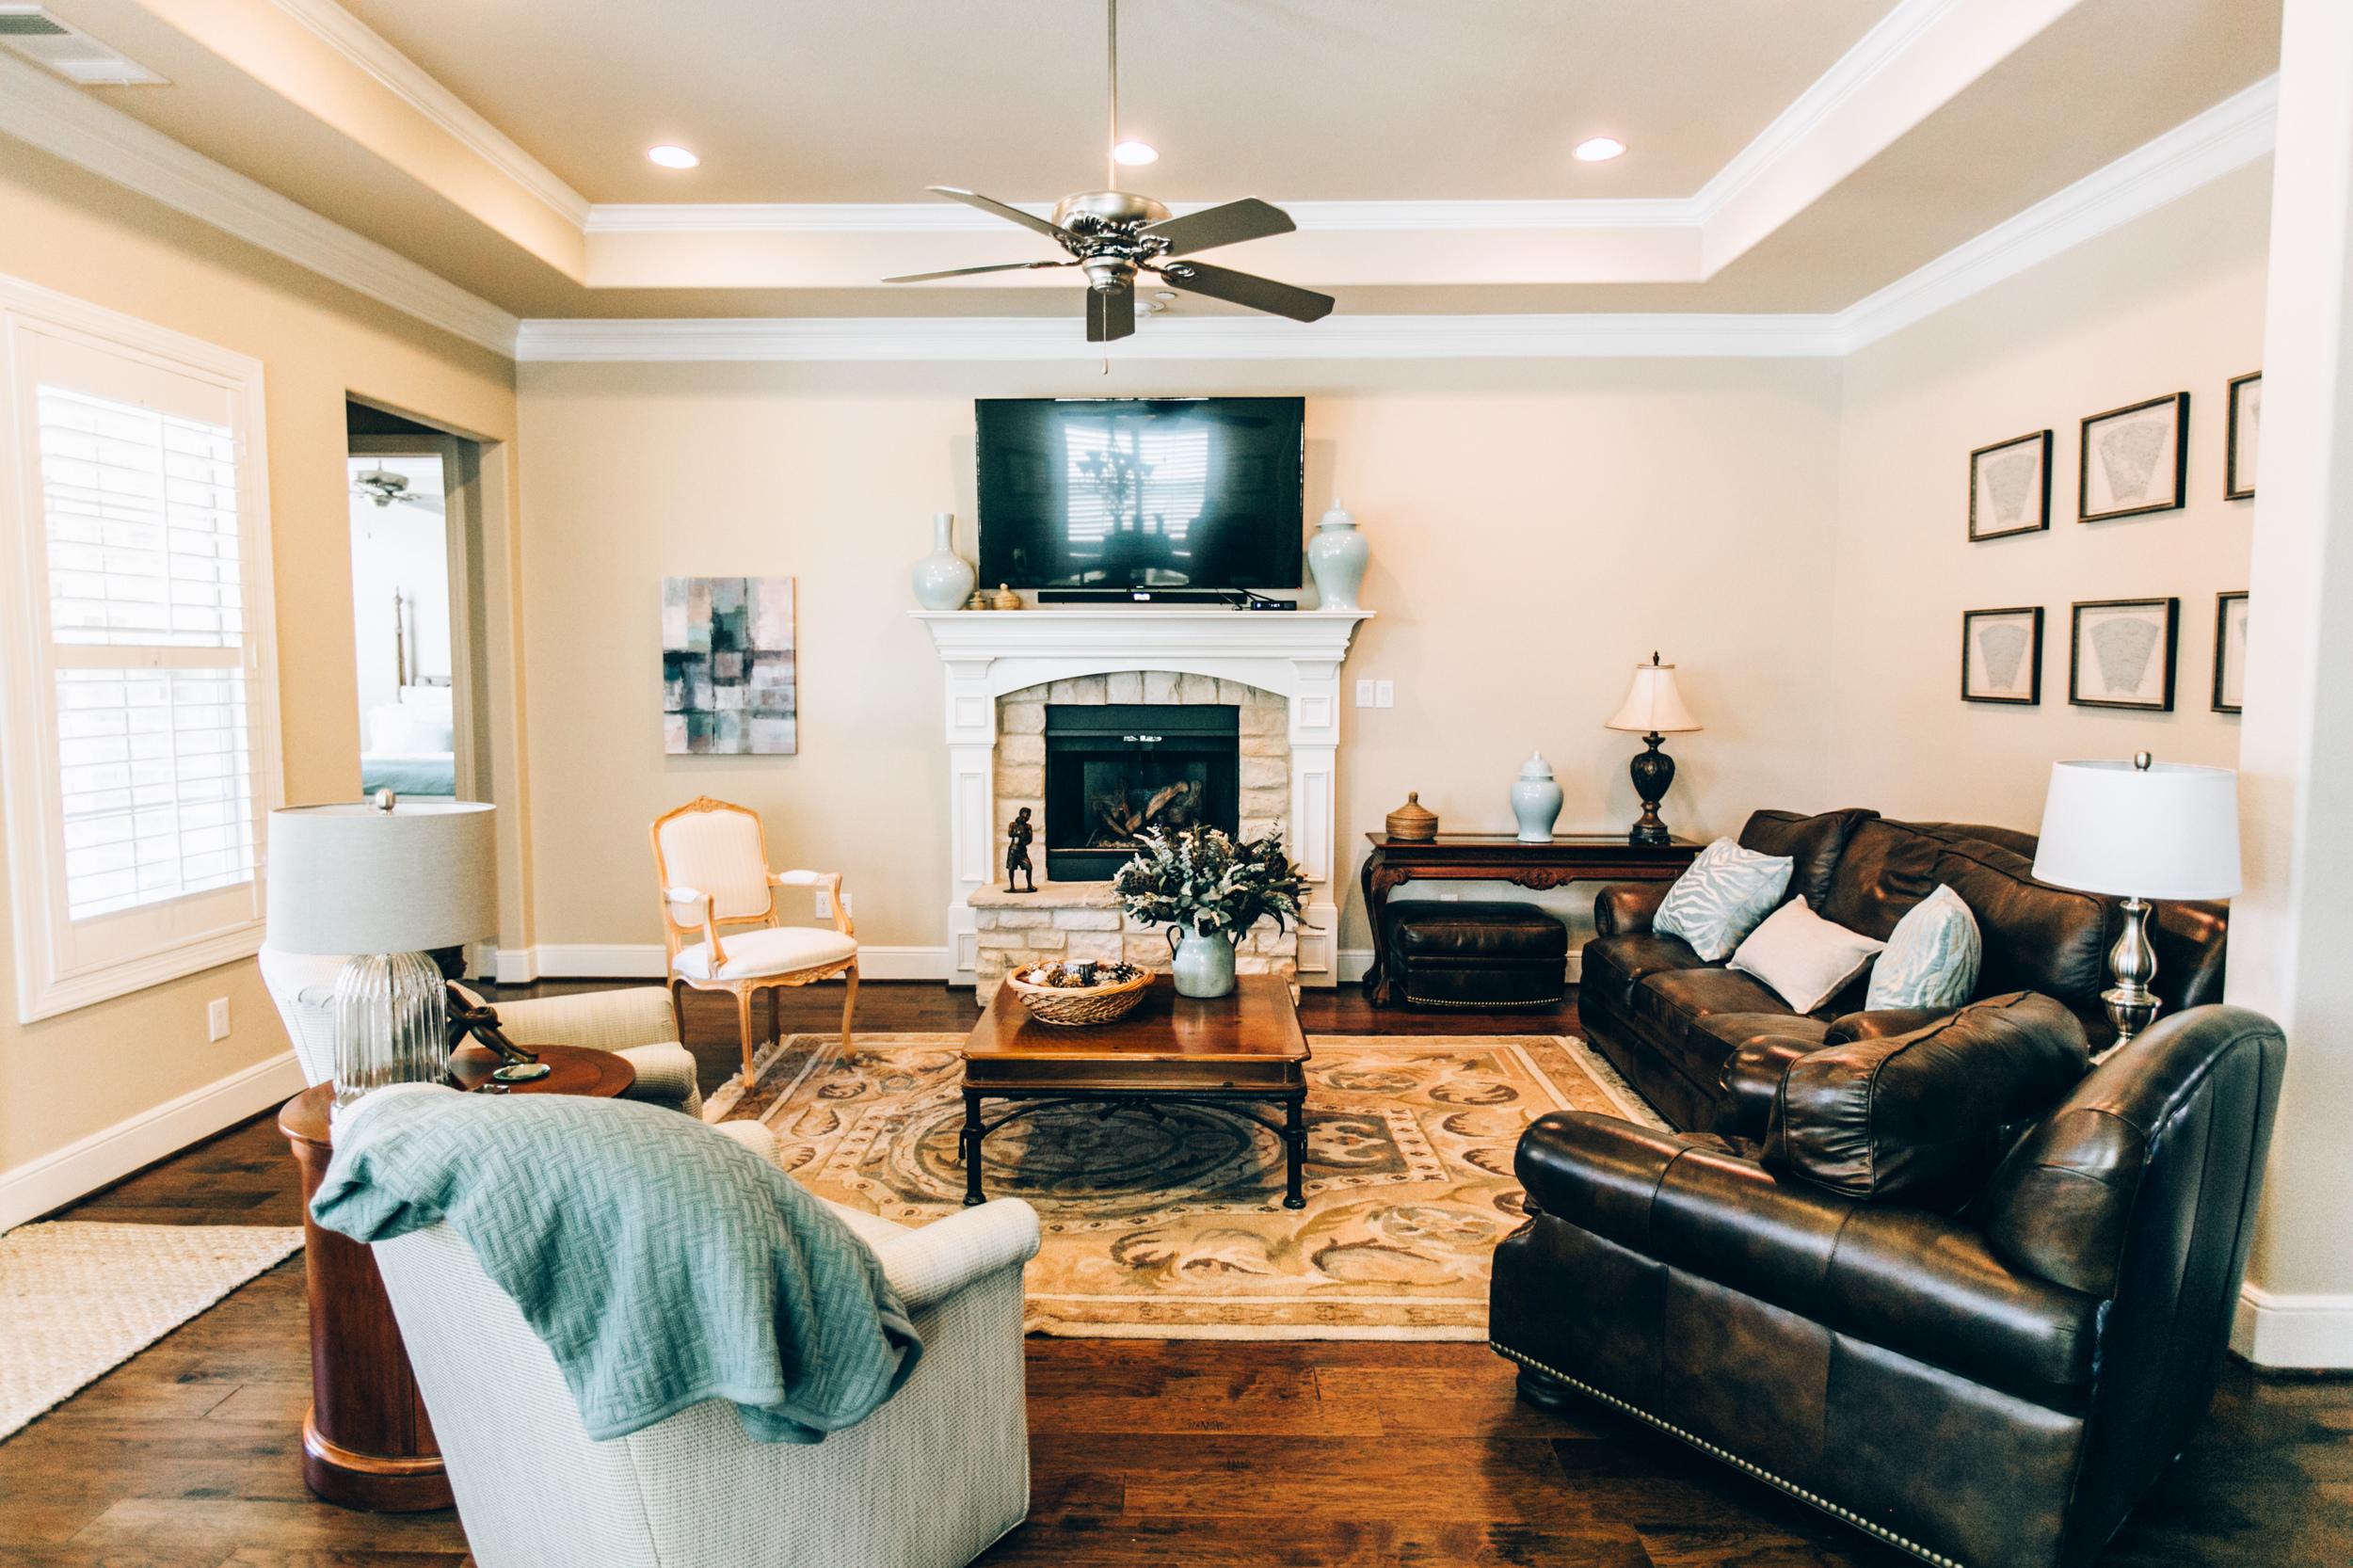 interior-design-home-decorating-328.jpg